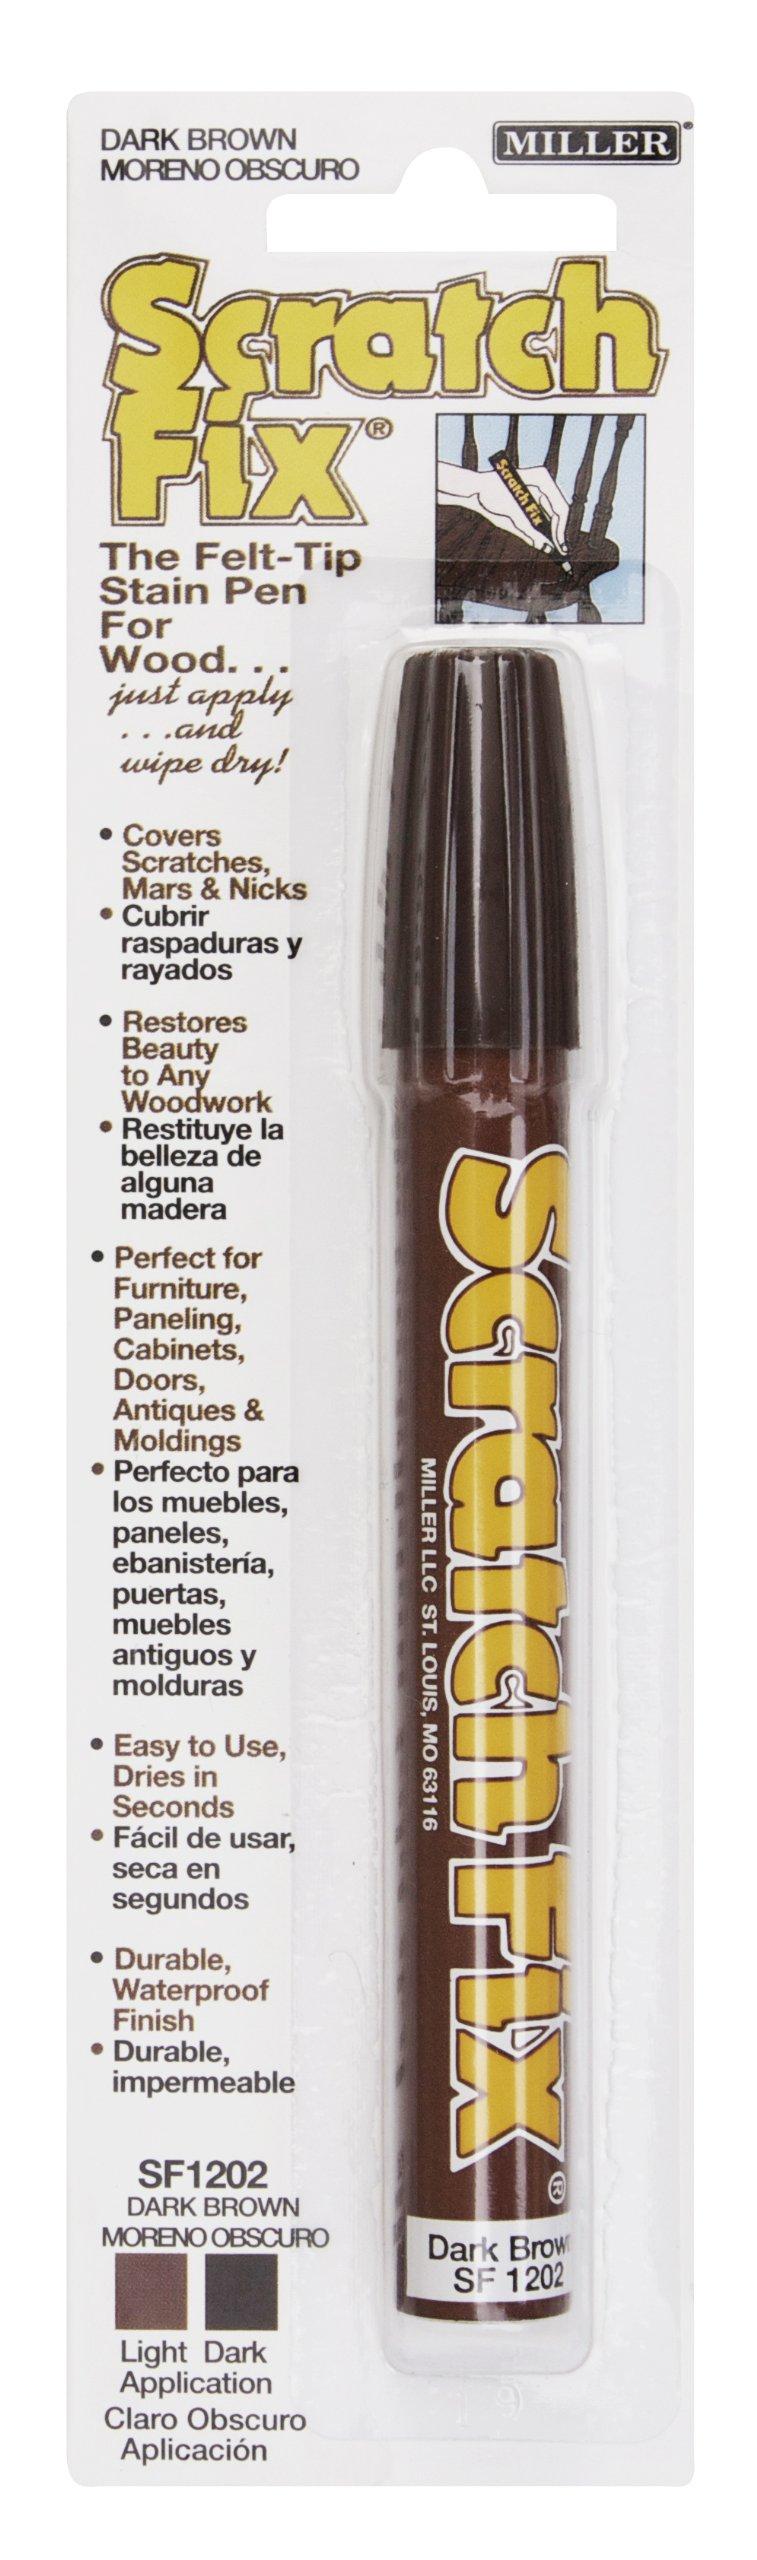 Miller SF1202 Wood Stain Scratch Fix Pen / Wood Repair Marker - Dark Brown Wood